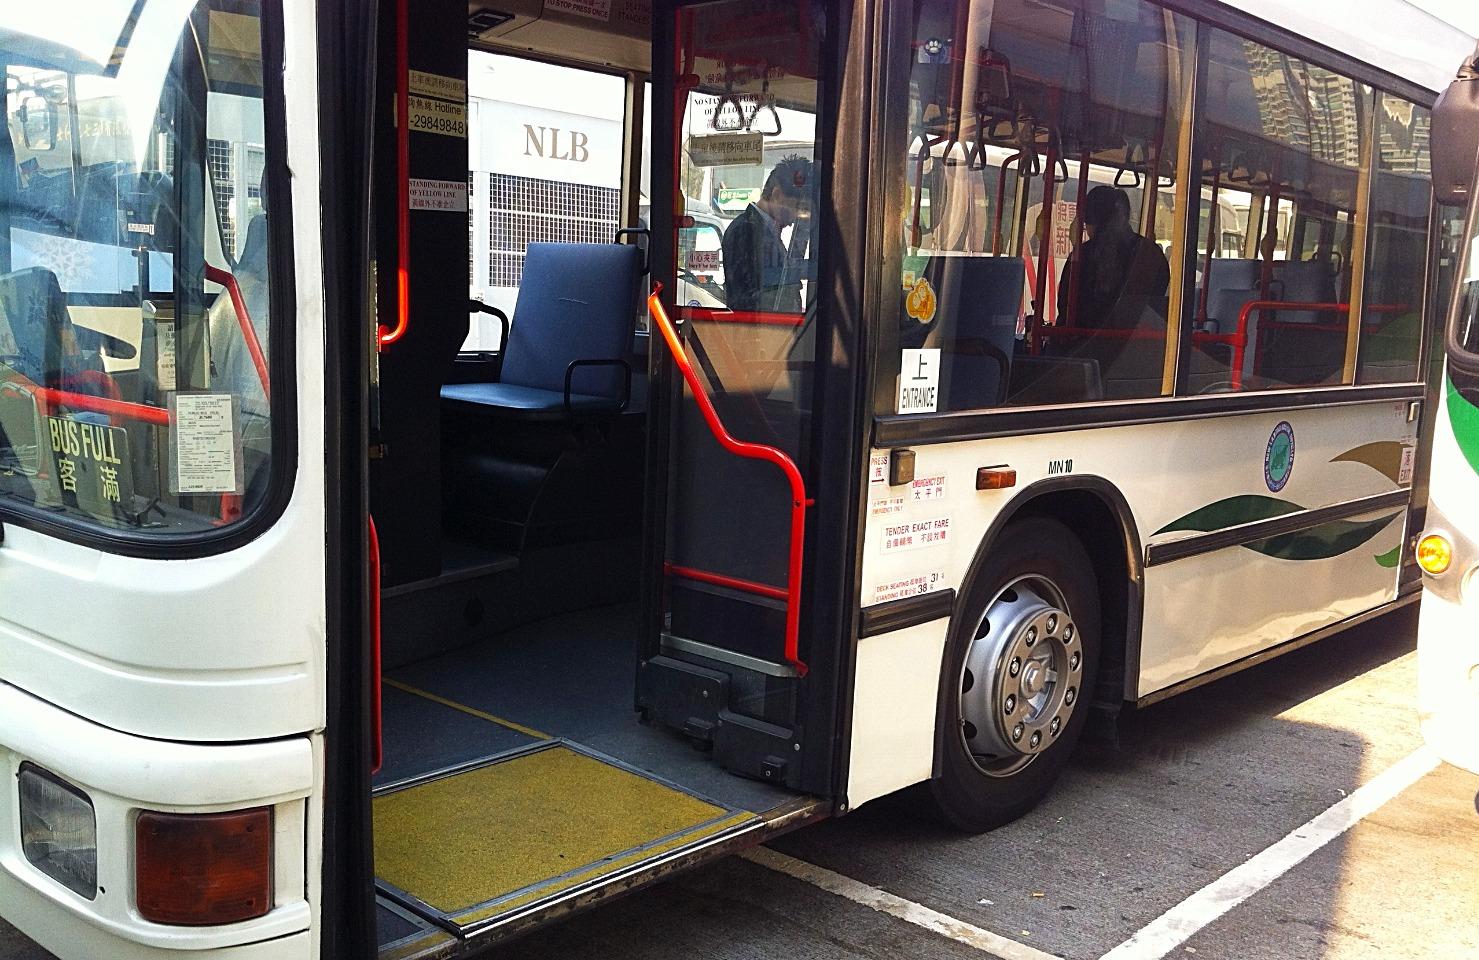 Air Oasis NIND6 in bus AC pic 1